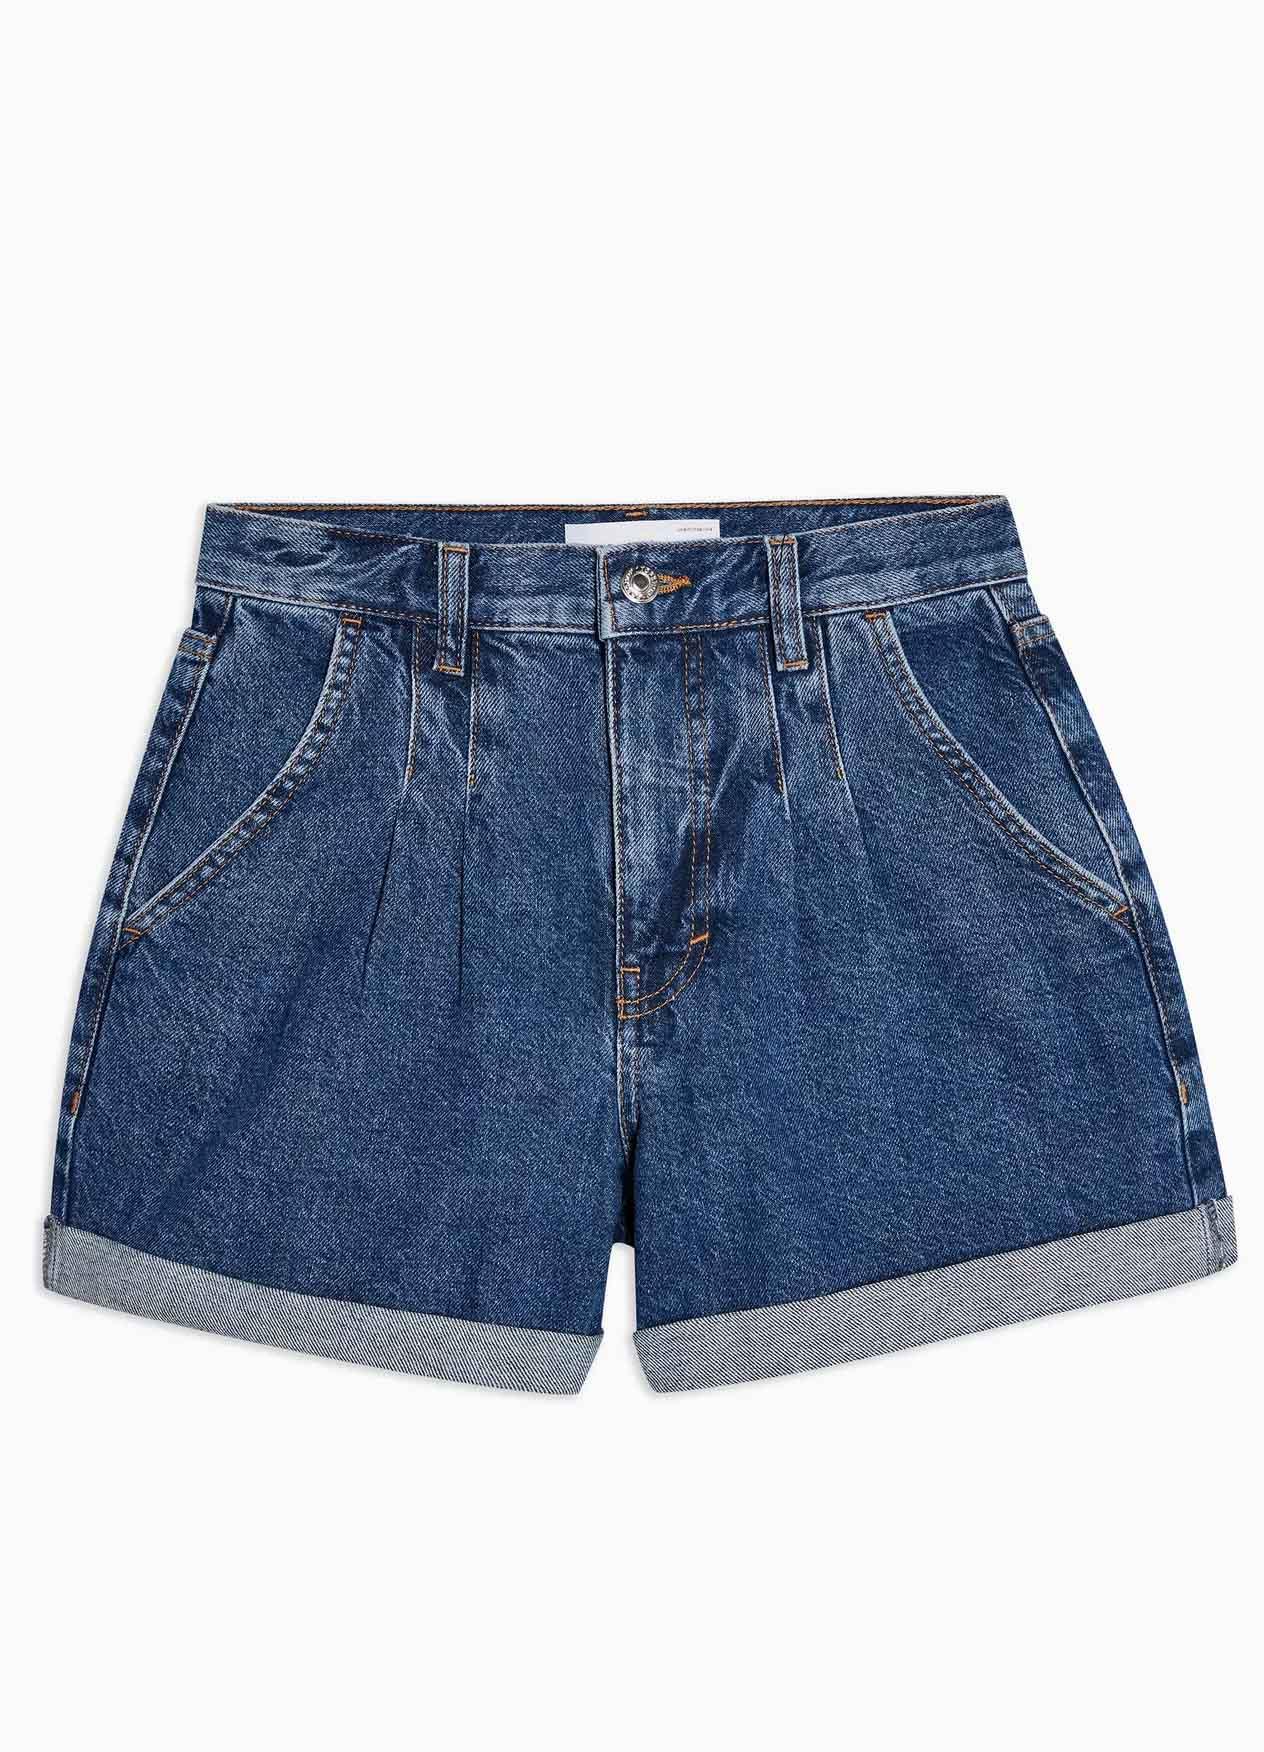 denim shorts topshop